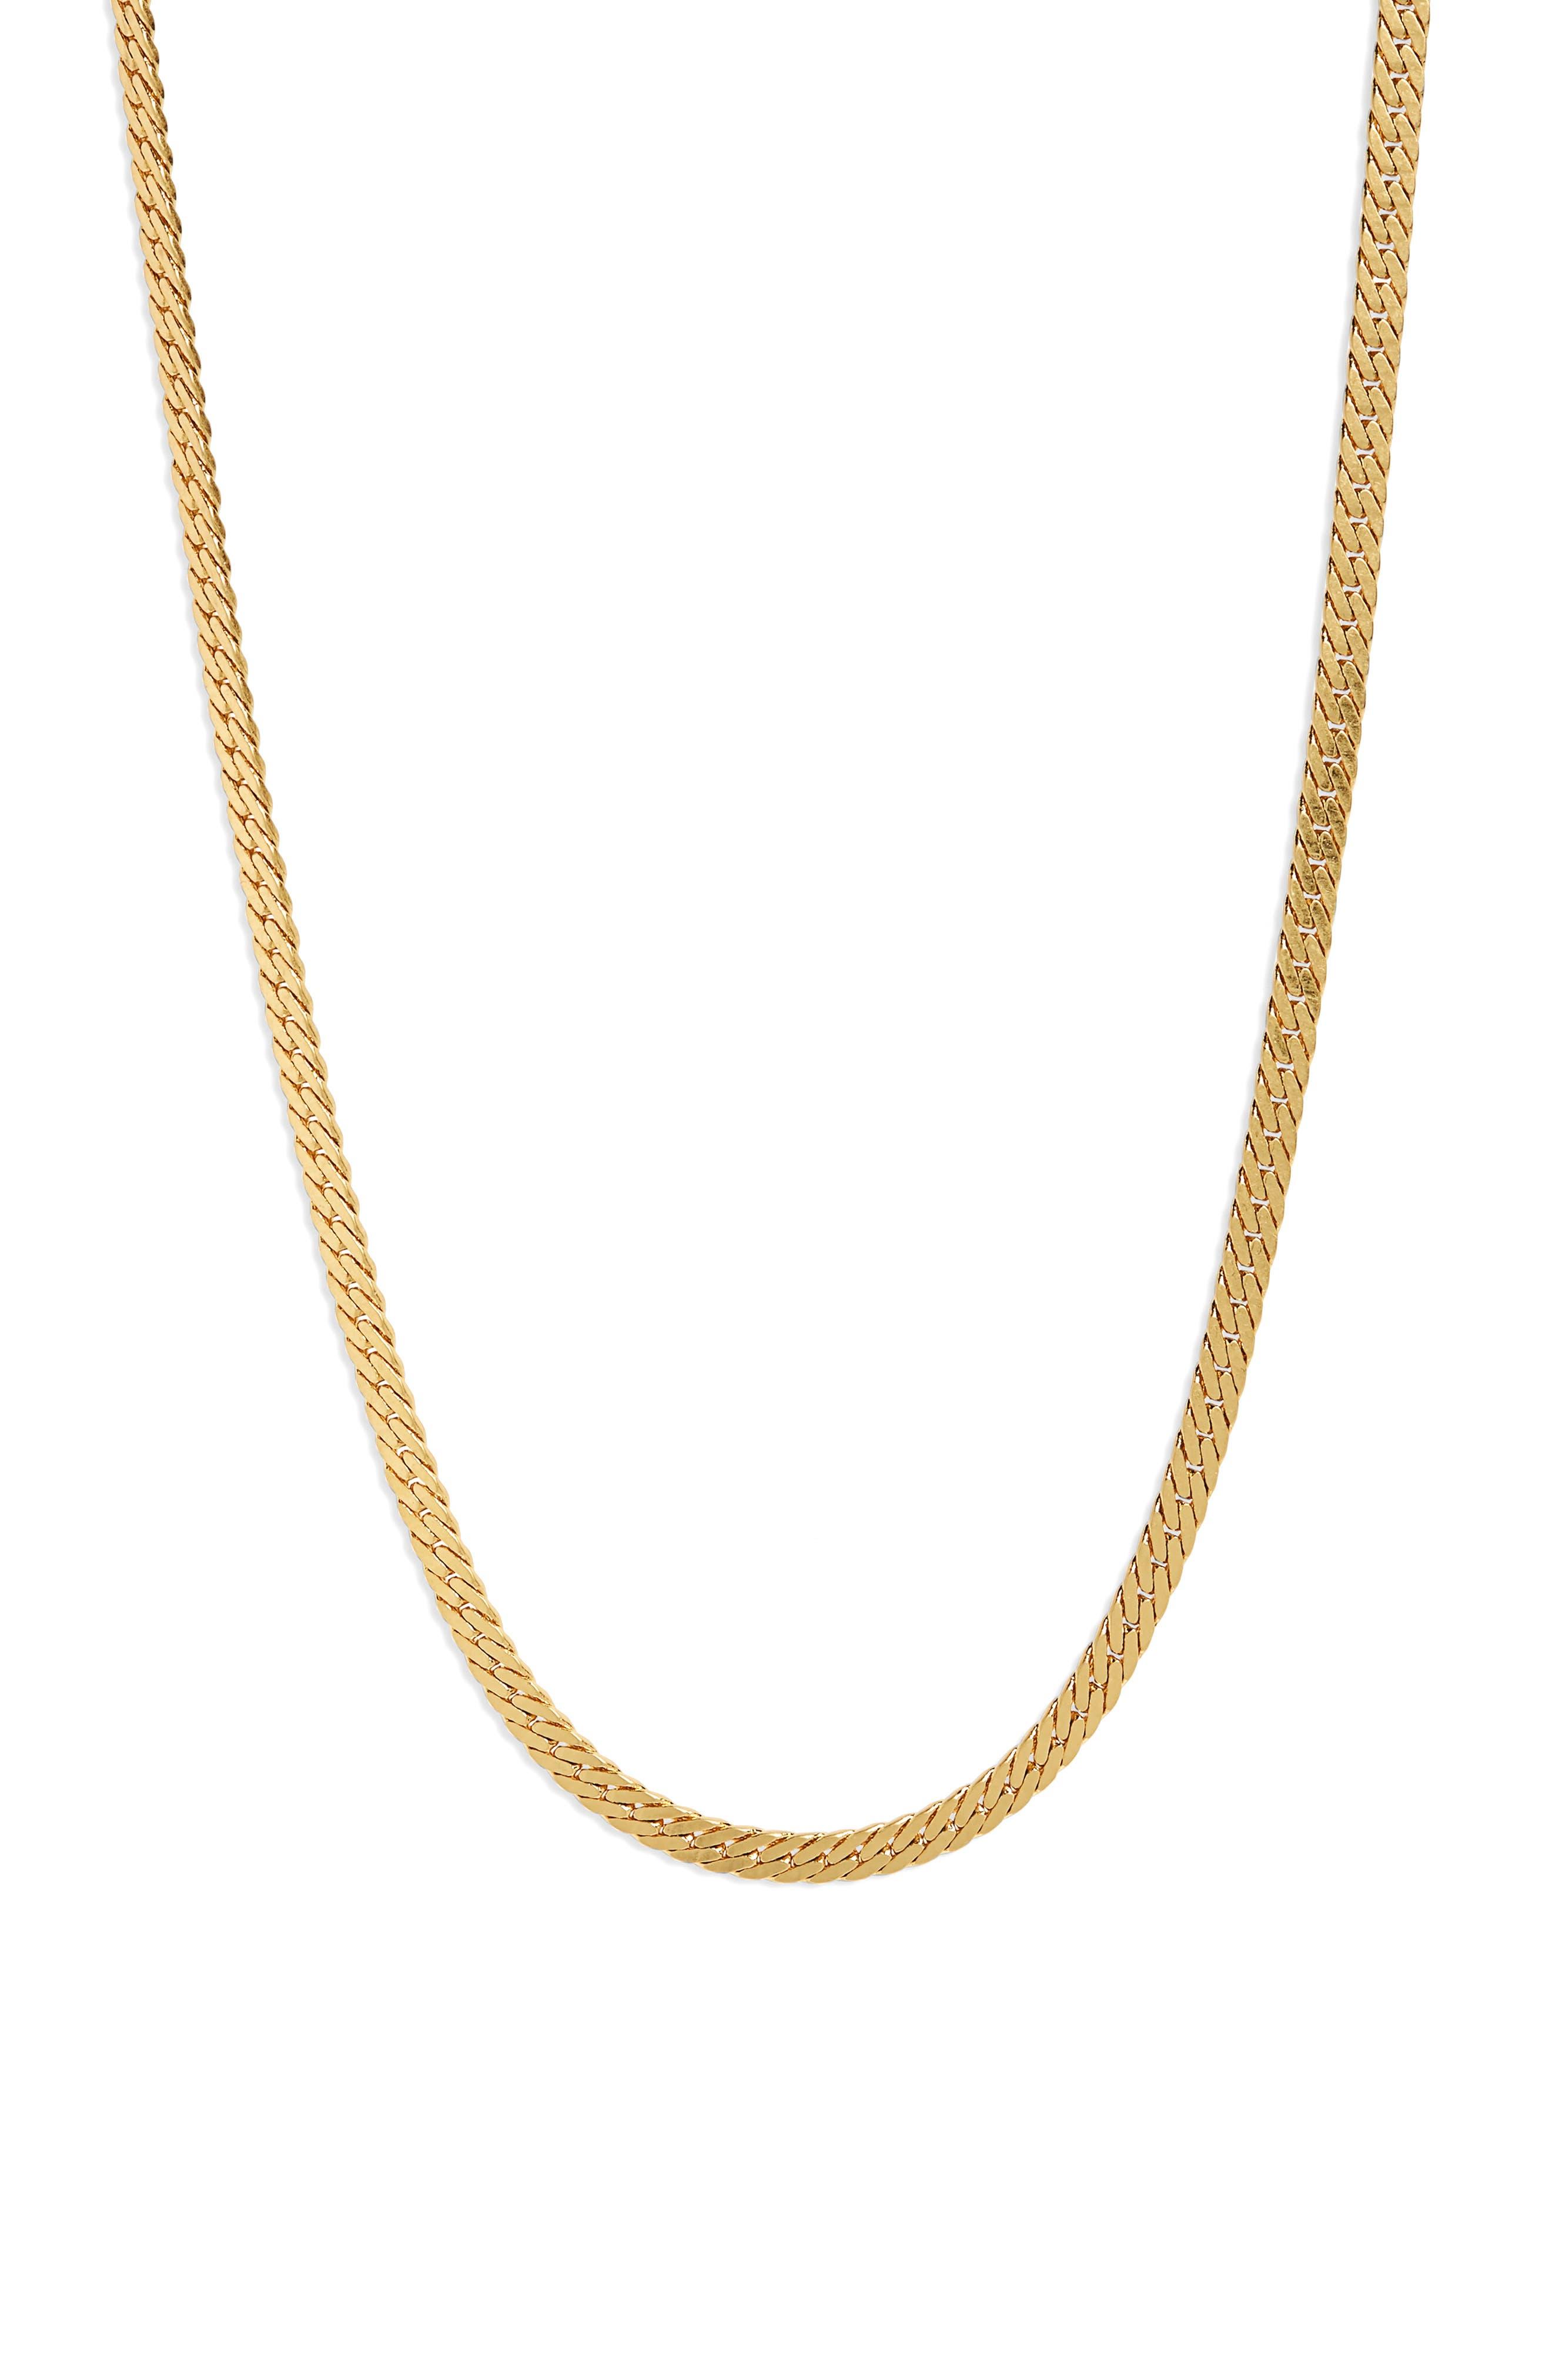 Simple Chain Necklace,                             Main thumbnail 1, color,                             VINTAGE GOLD